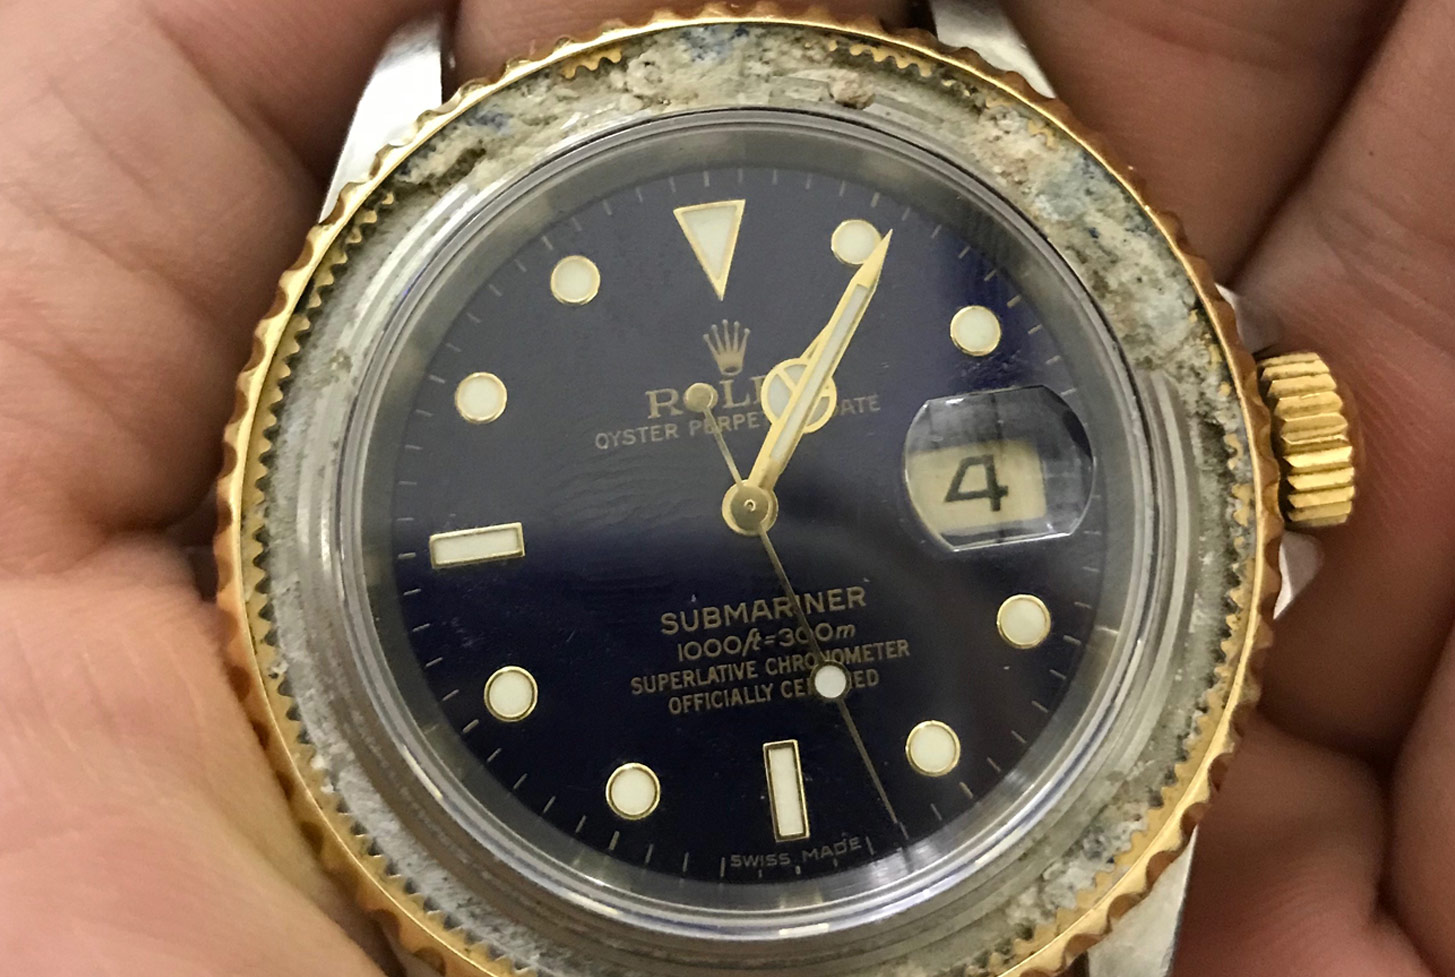 Rolex Submariner watch repair